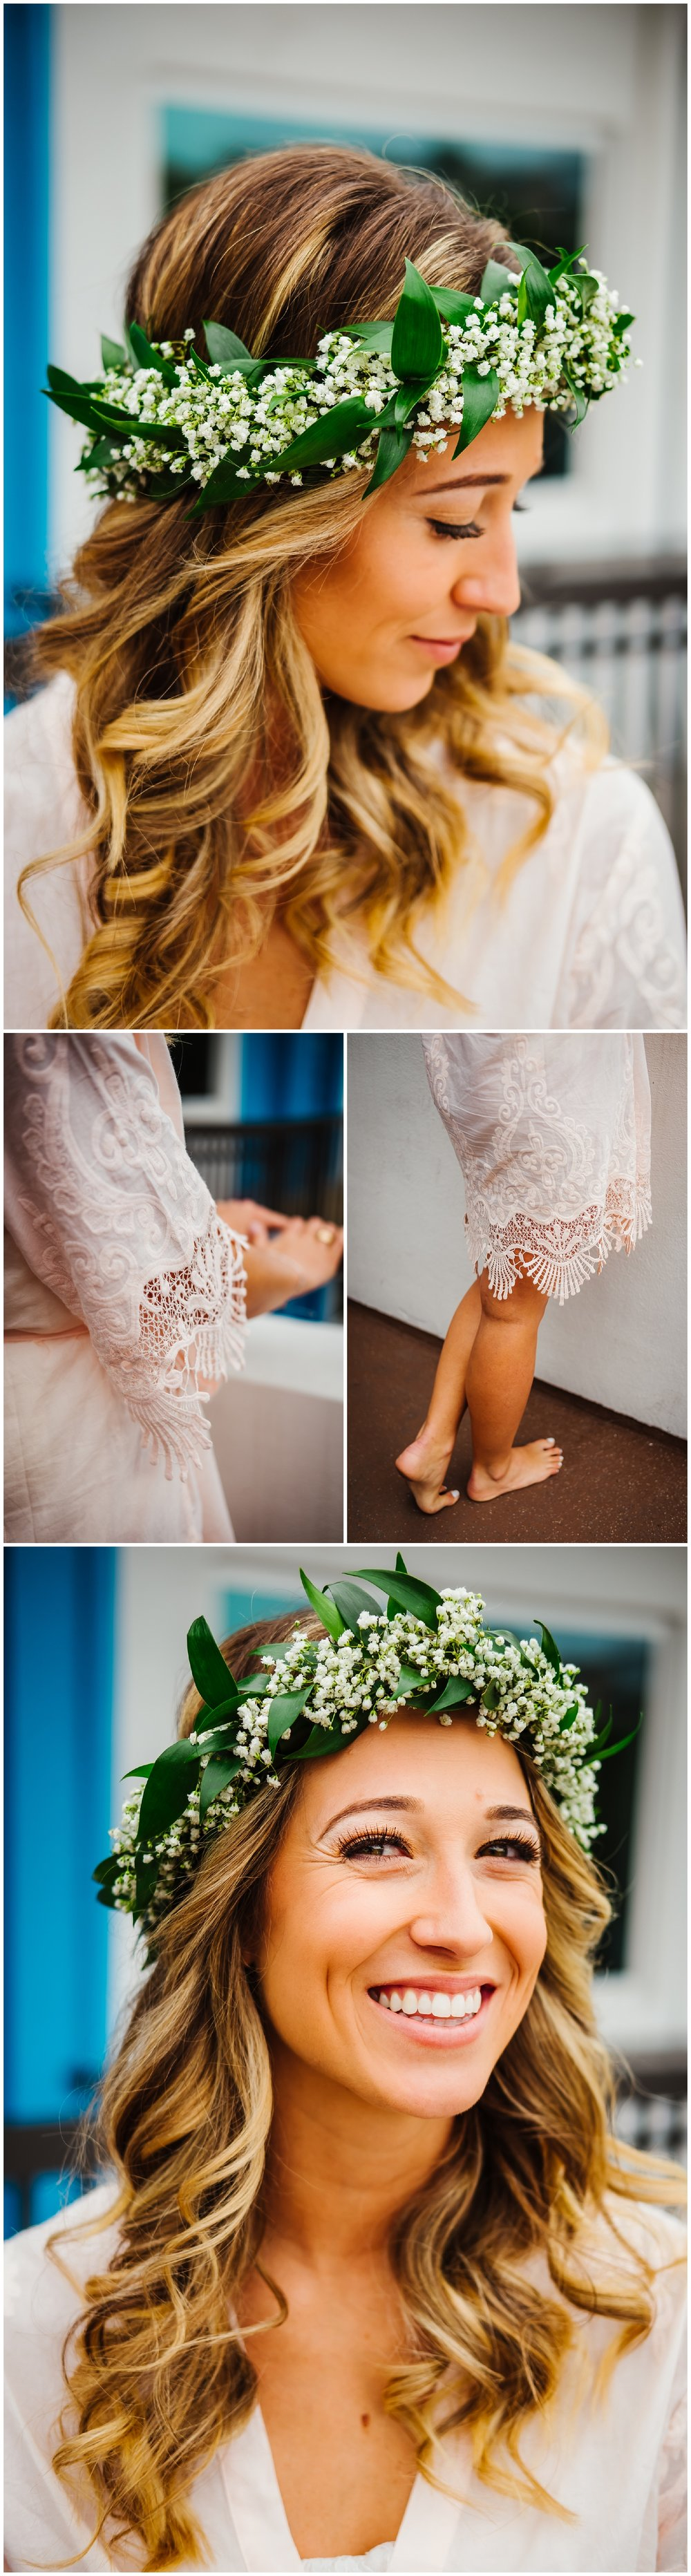 tampa-bay-wedding-photographer-barefoot-post-card-inn-tropical-hawaiin-lei-pink-pineapples-flower-crown_0120.jpg